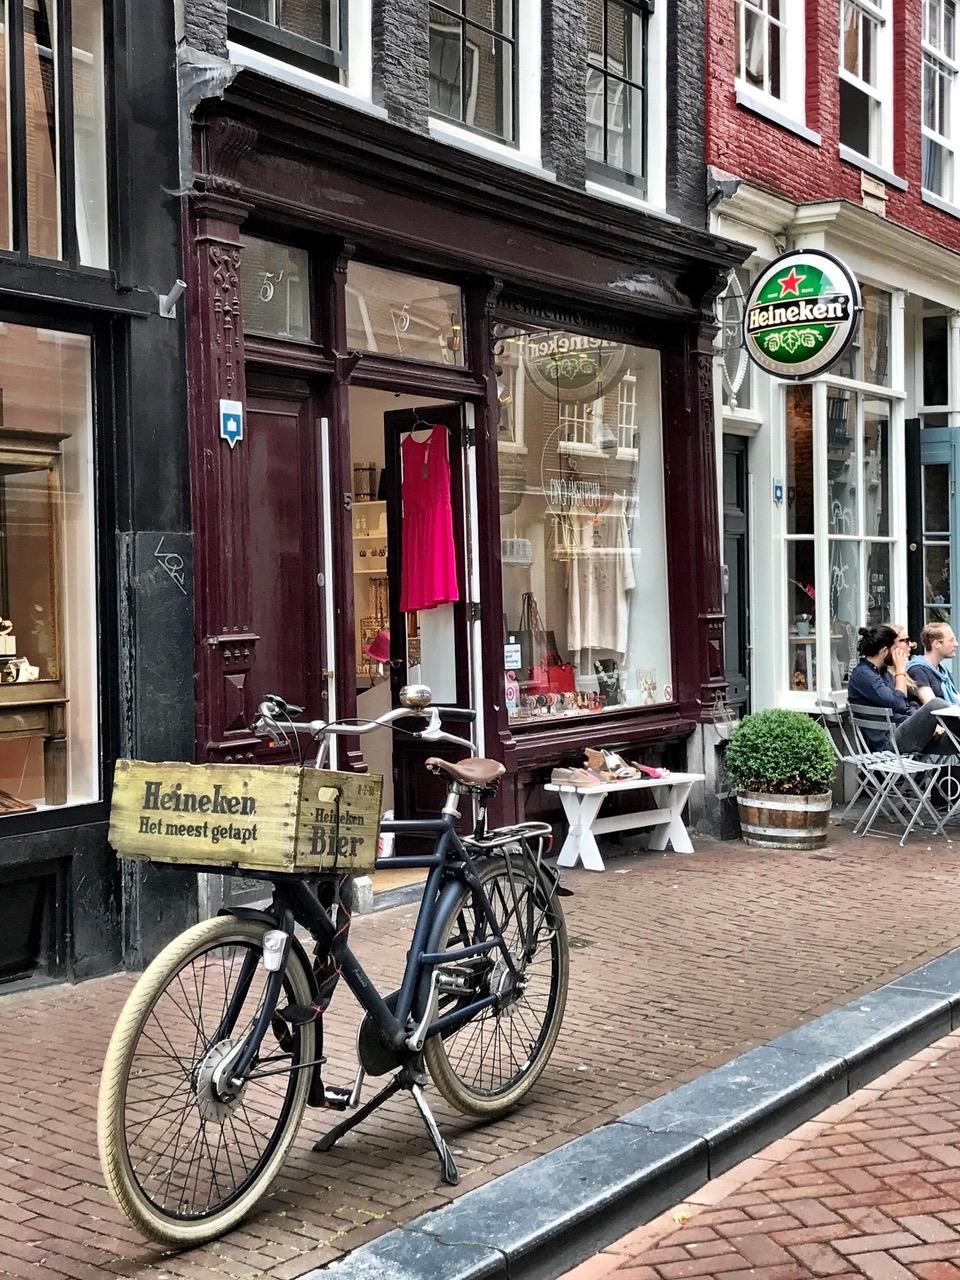 Reestraat, Heineken, Amsterdam, The Netherlands